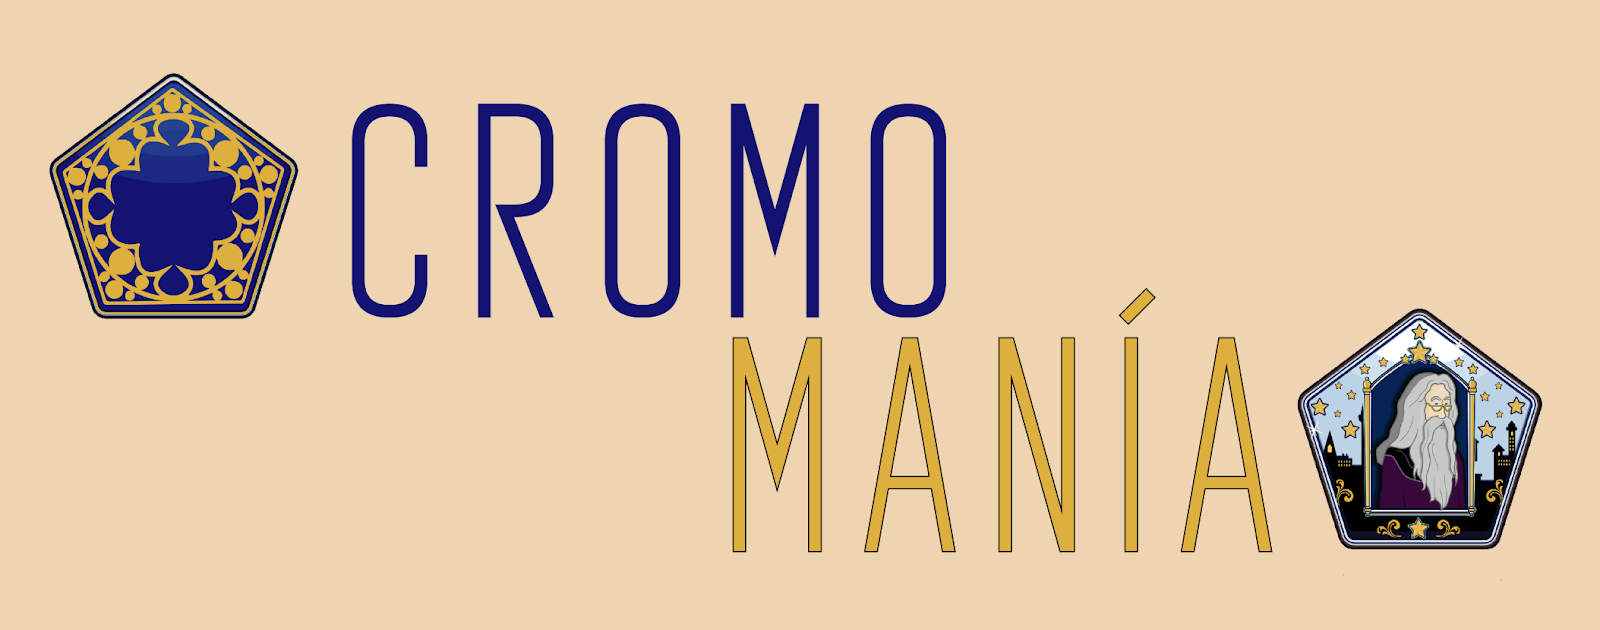 cromomania%25403x%2Bcopy.png